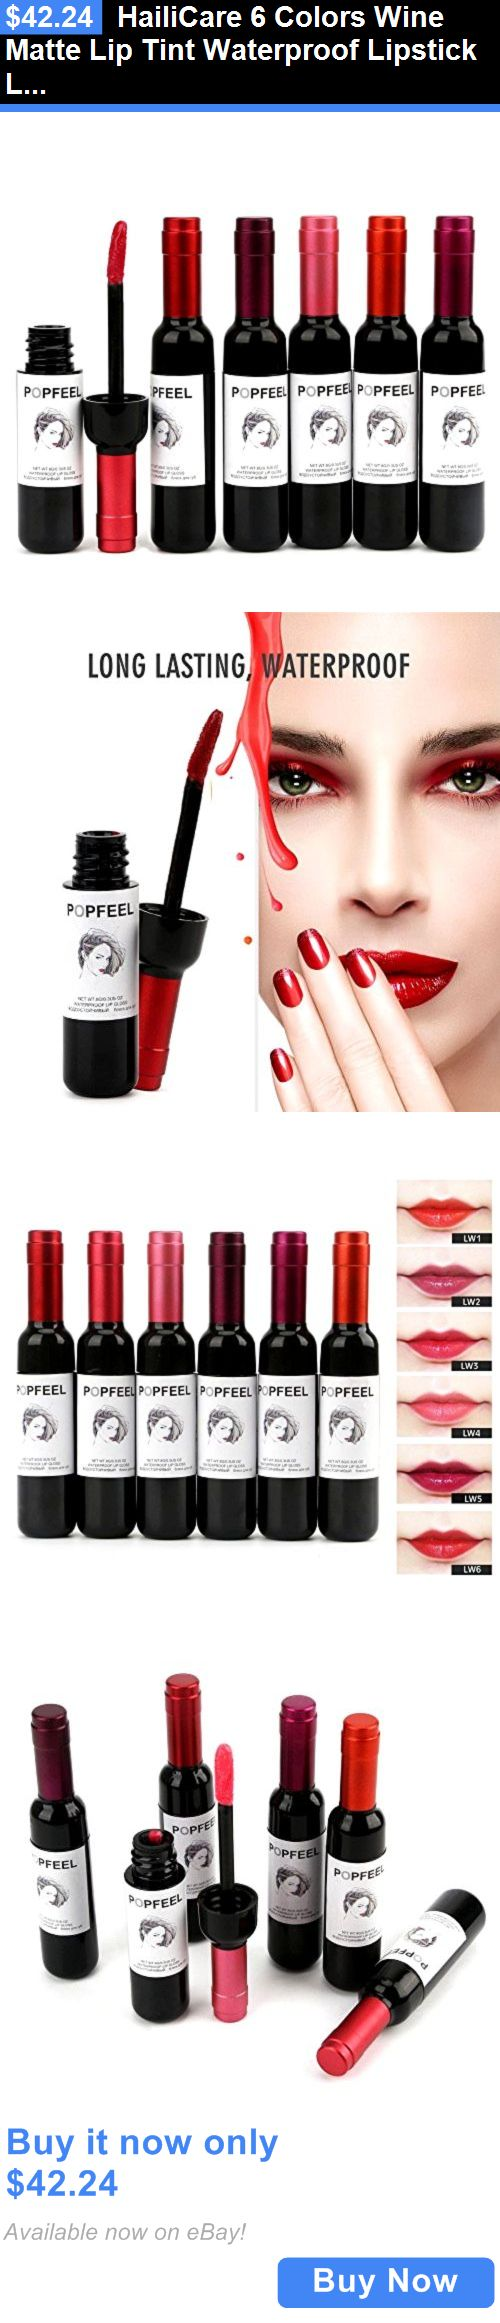 Beauty Makeup: Hailicare 6 Colors Wine Matte Lip Tint Waterproof Lipstick Lip Gloss 6Pcs/Lot BUY IT NOW ONLY: $42.24